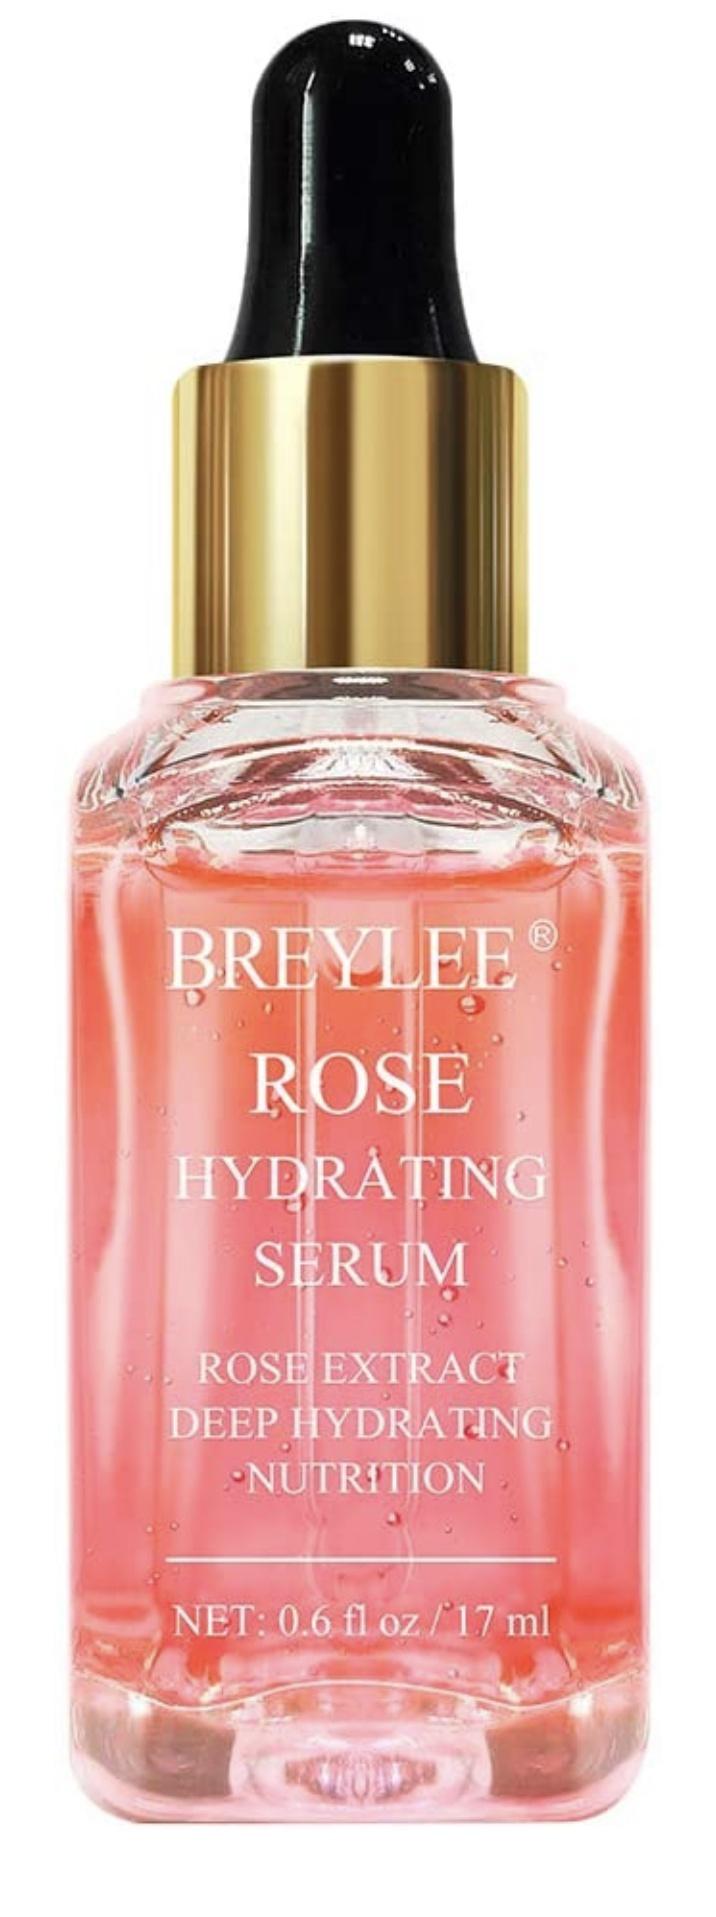 Breylee Rose Face Serum